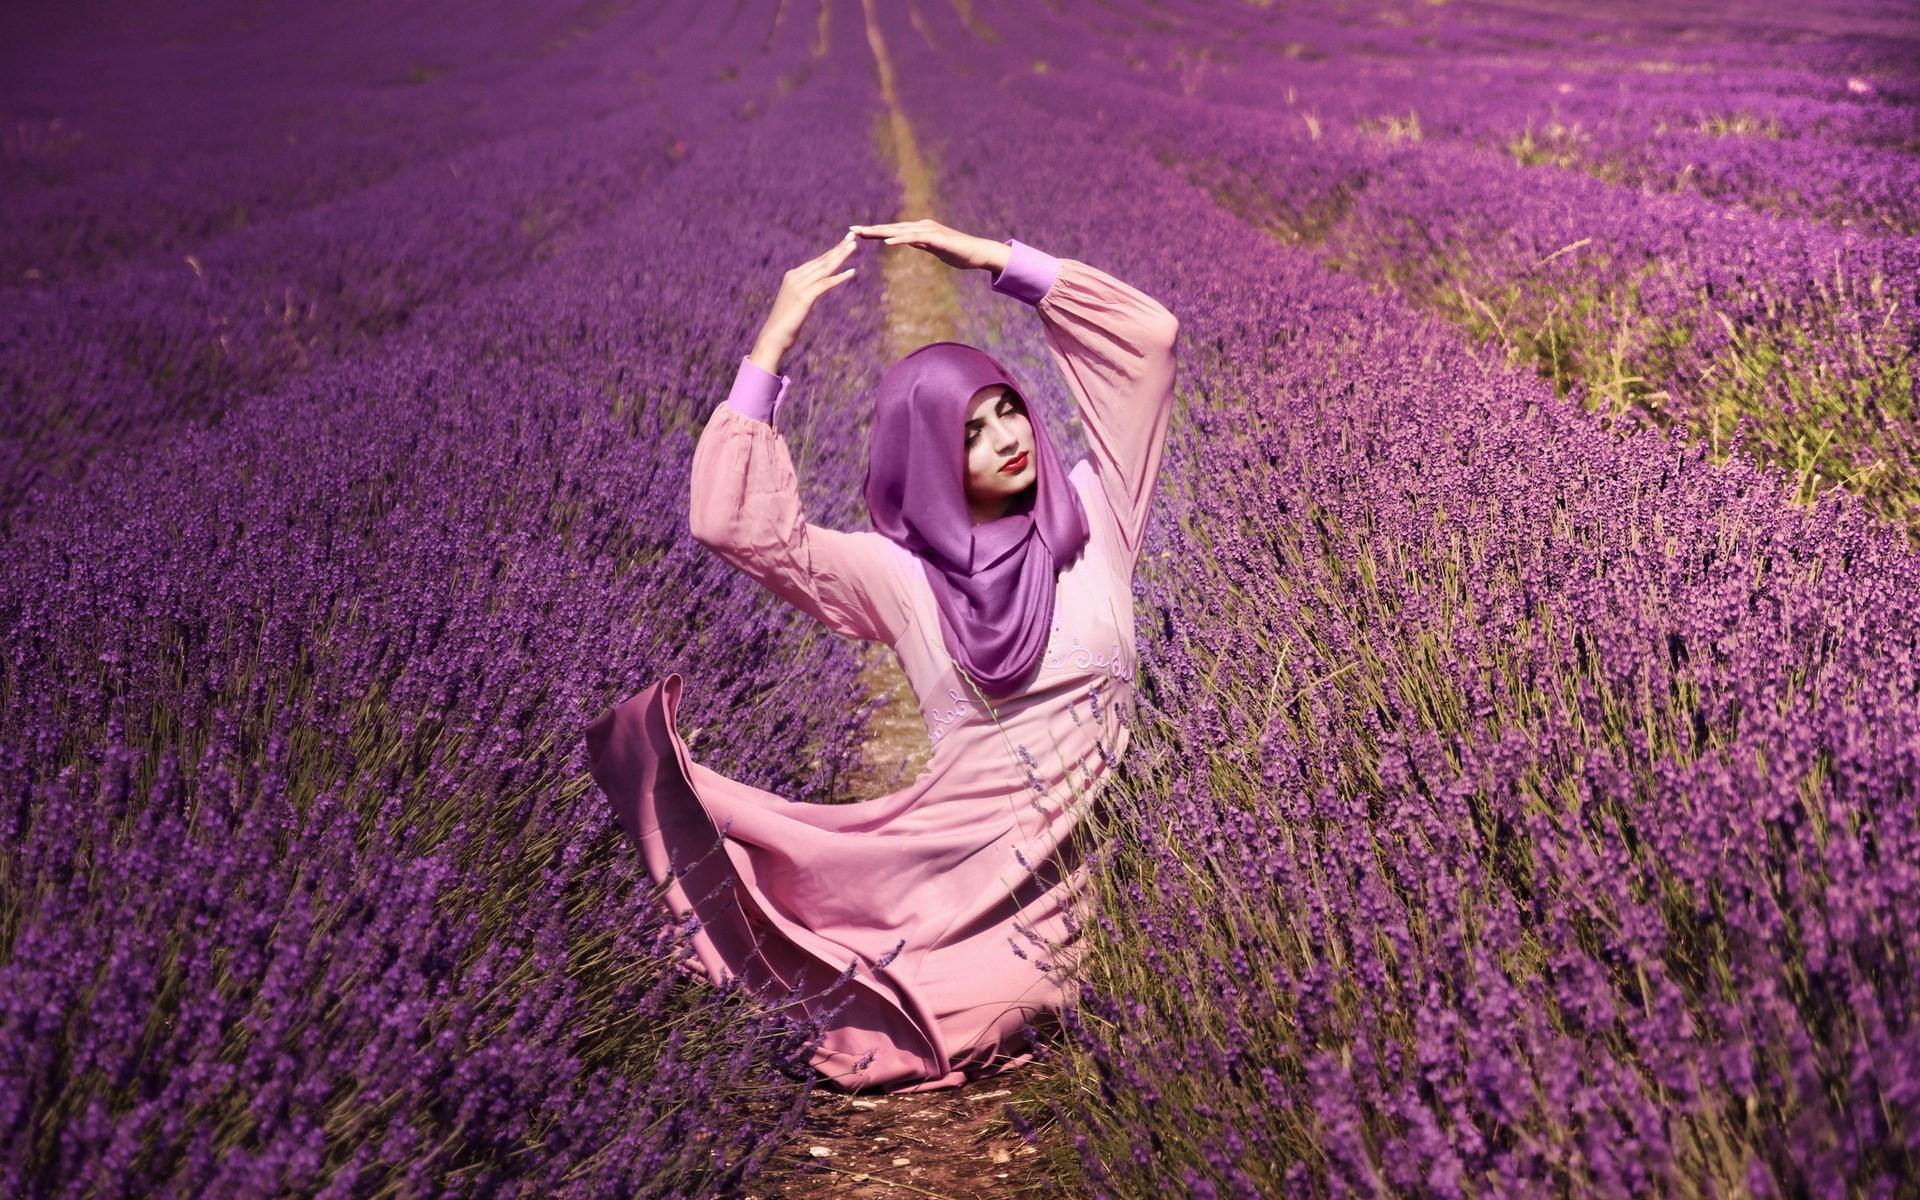 Girl Field Flowers Lavender Mood #6948806